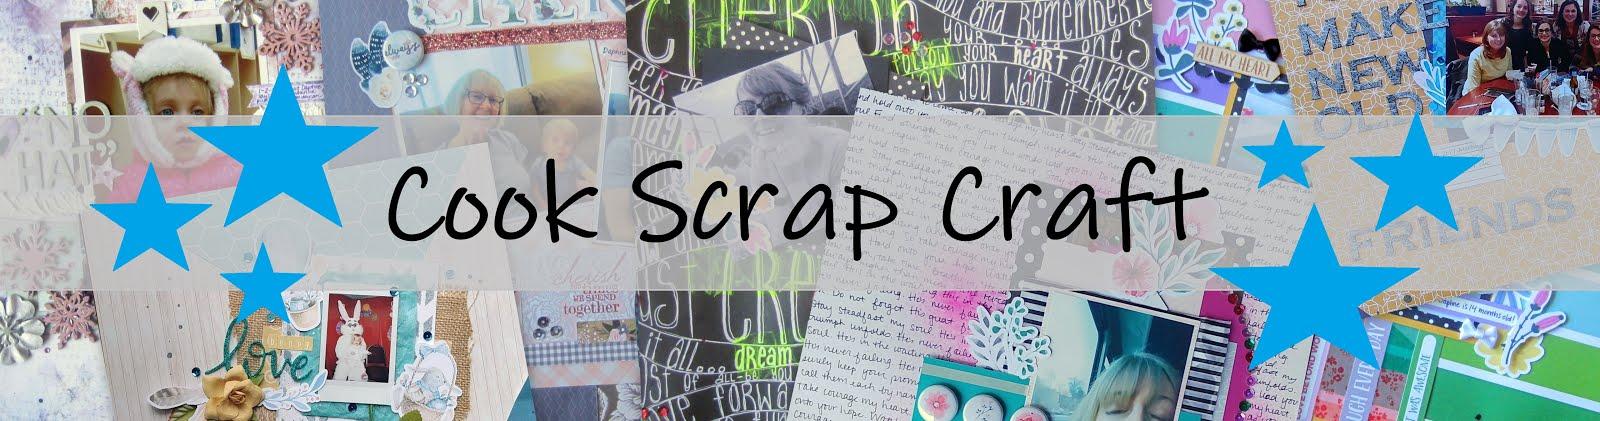 Cook Scrap Craft